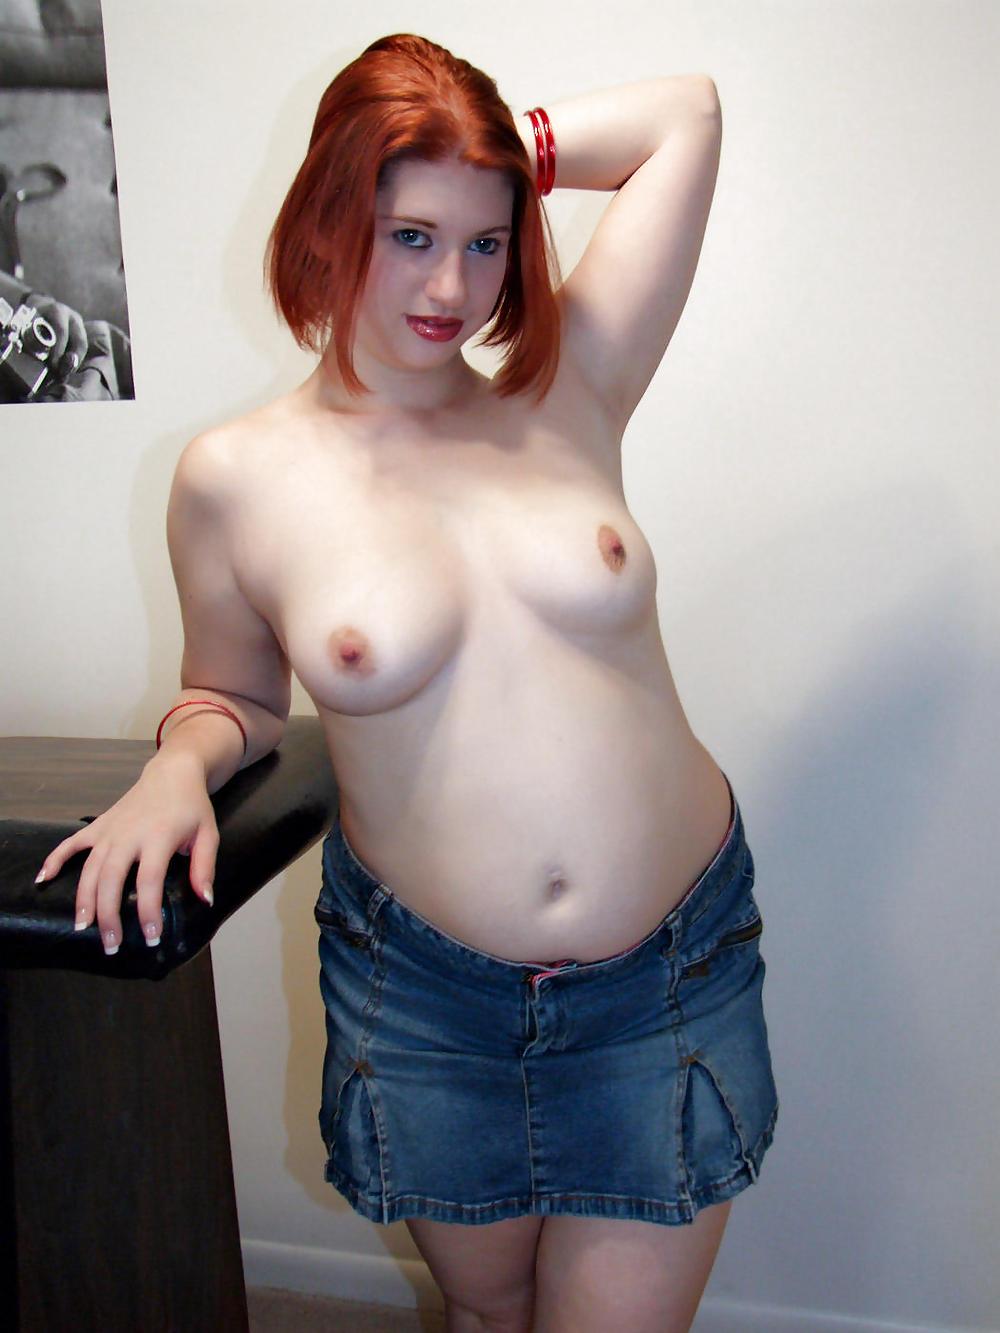 fat-redhead-rhode-island-girl-nude